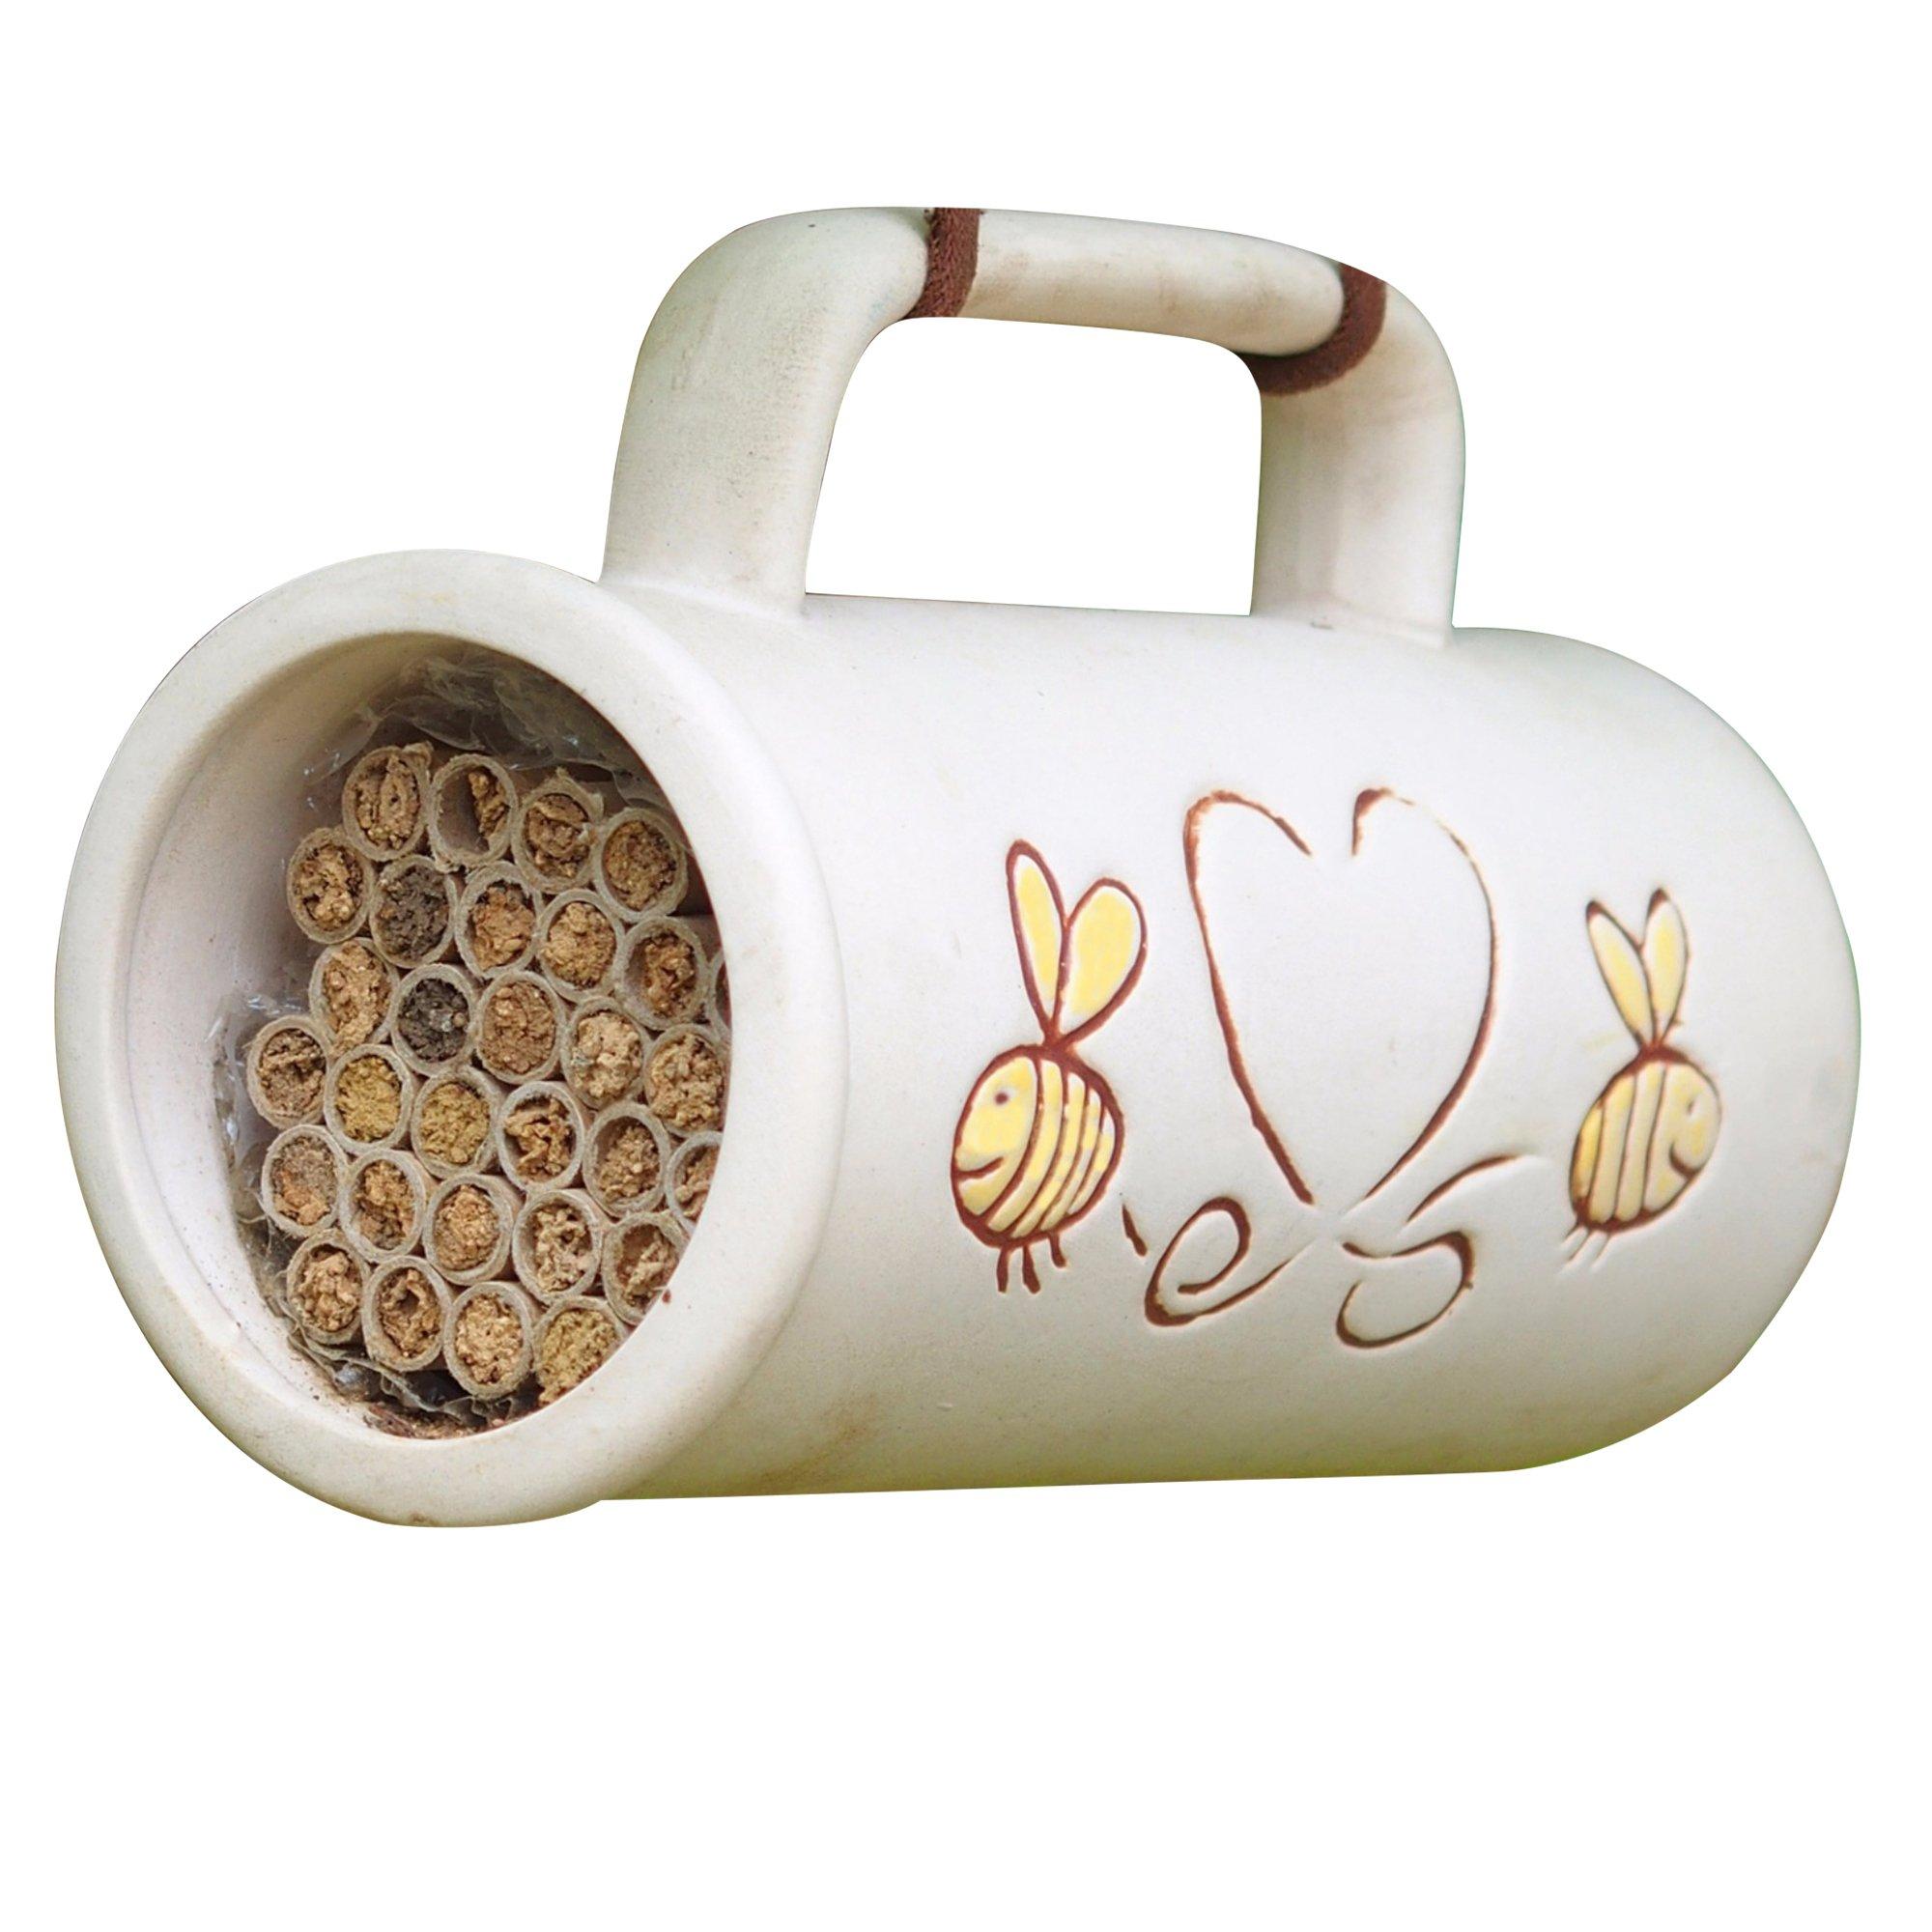 Wildlife World Pollinating Bee Mug (One Size) (White) by Wildlife World Ltd